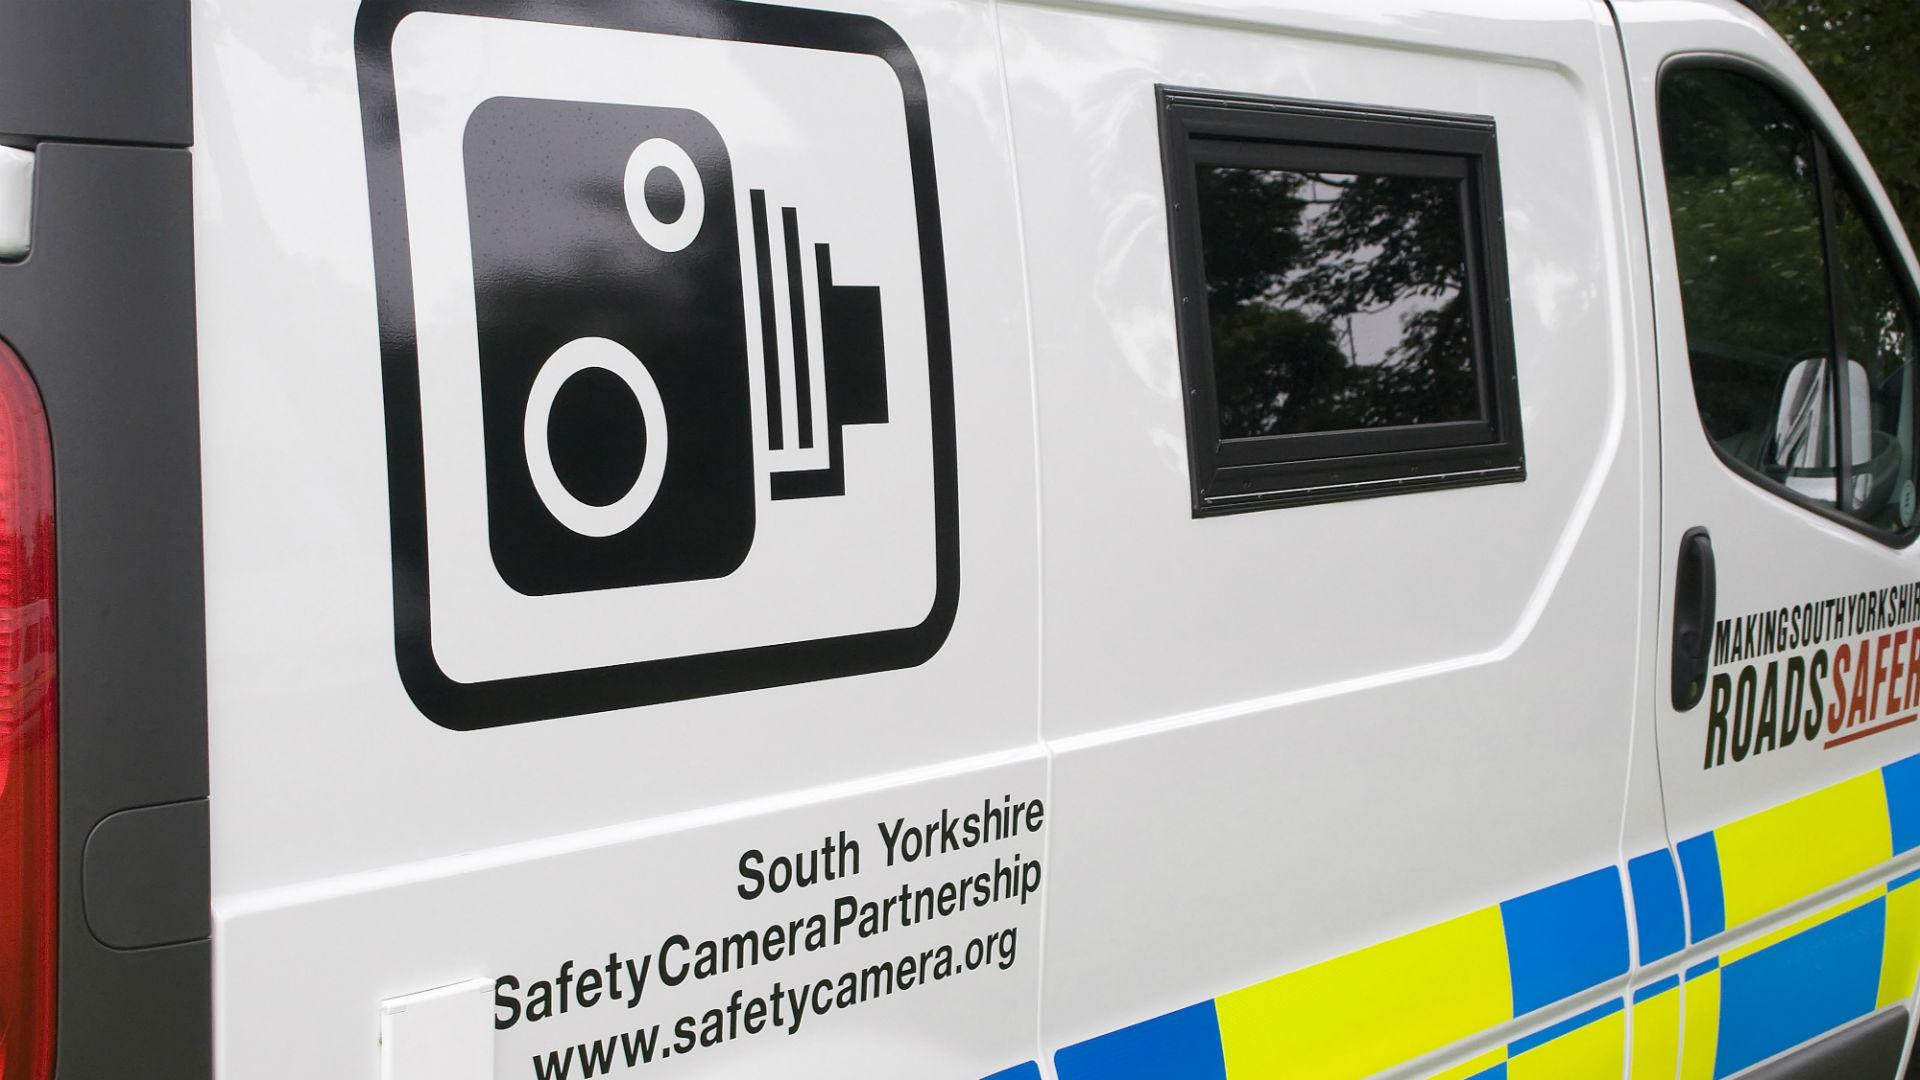 Safety camera partnership van